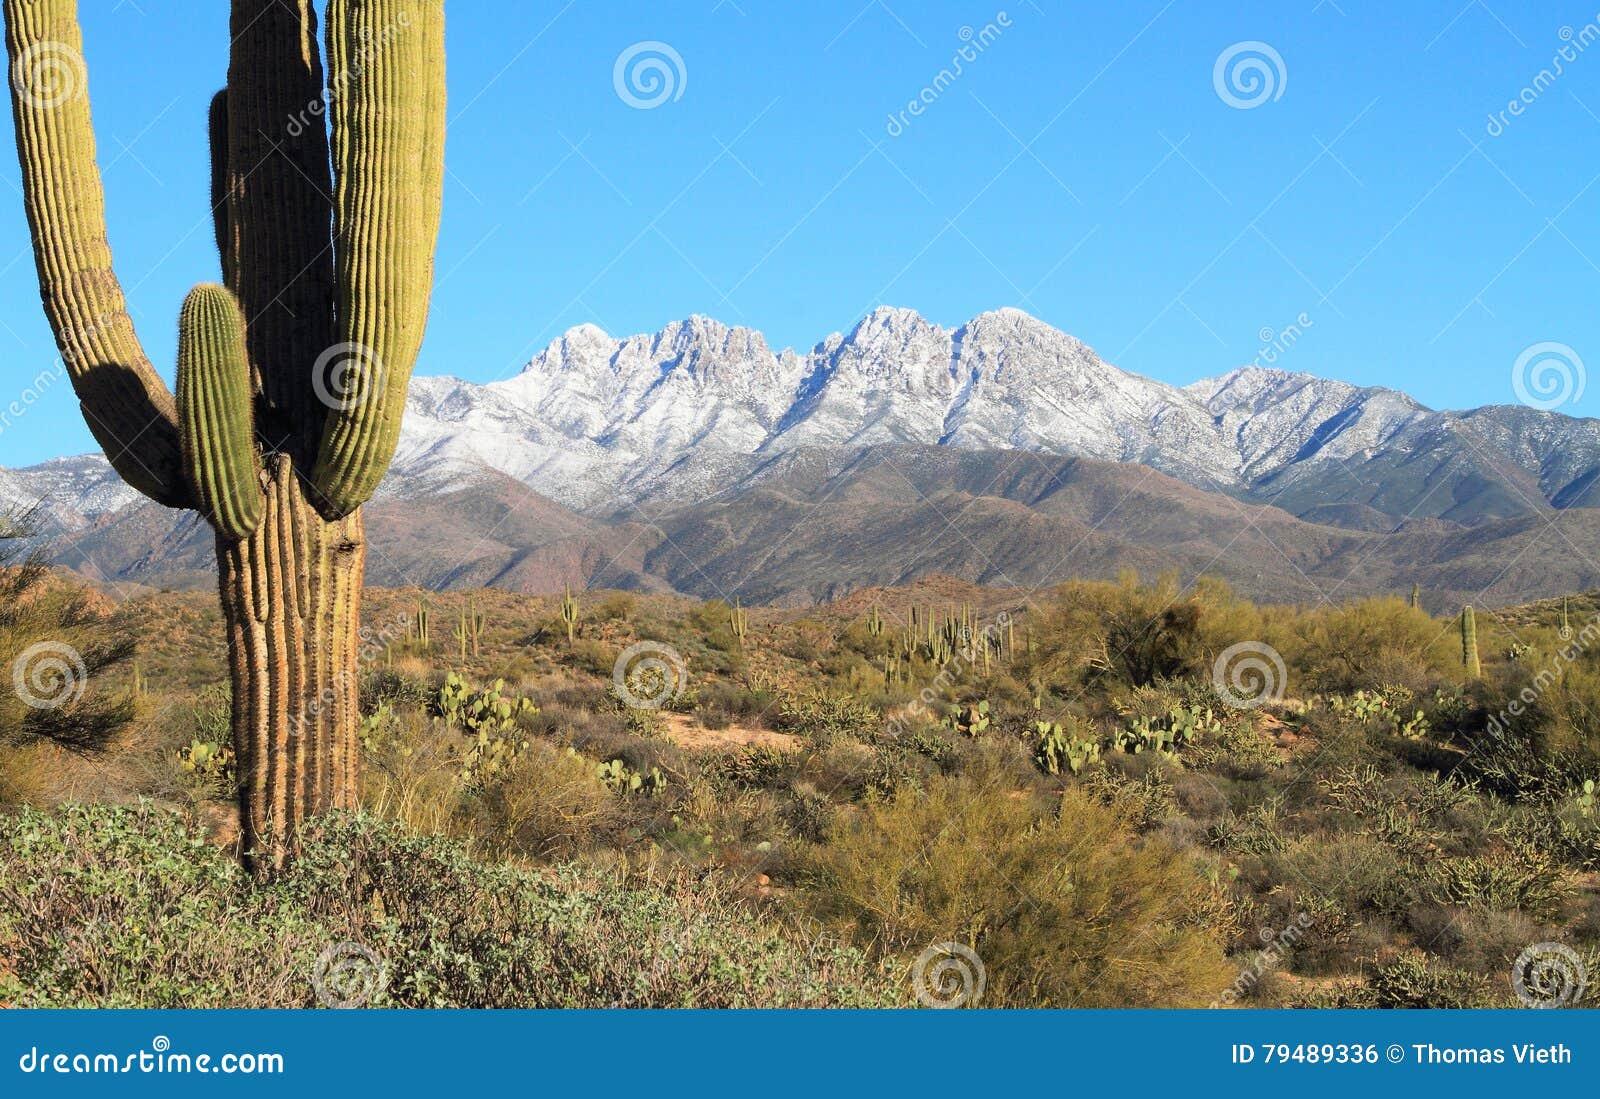 USA, Arizona: Snow on Four Peaks/Winter in the Sonoran Desert